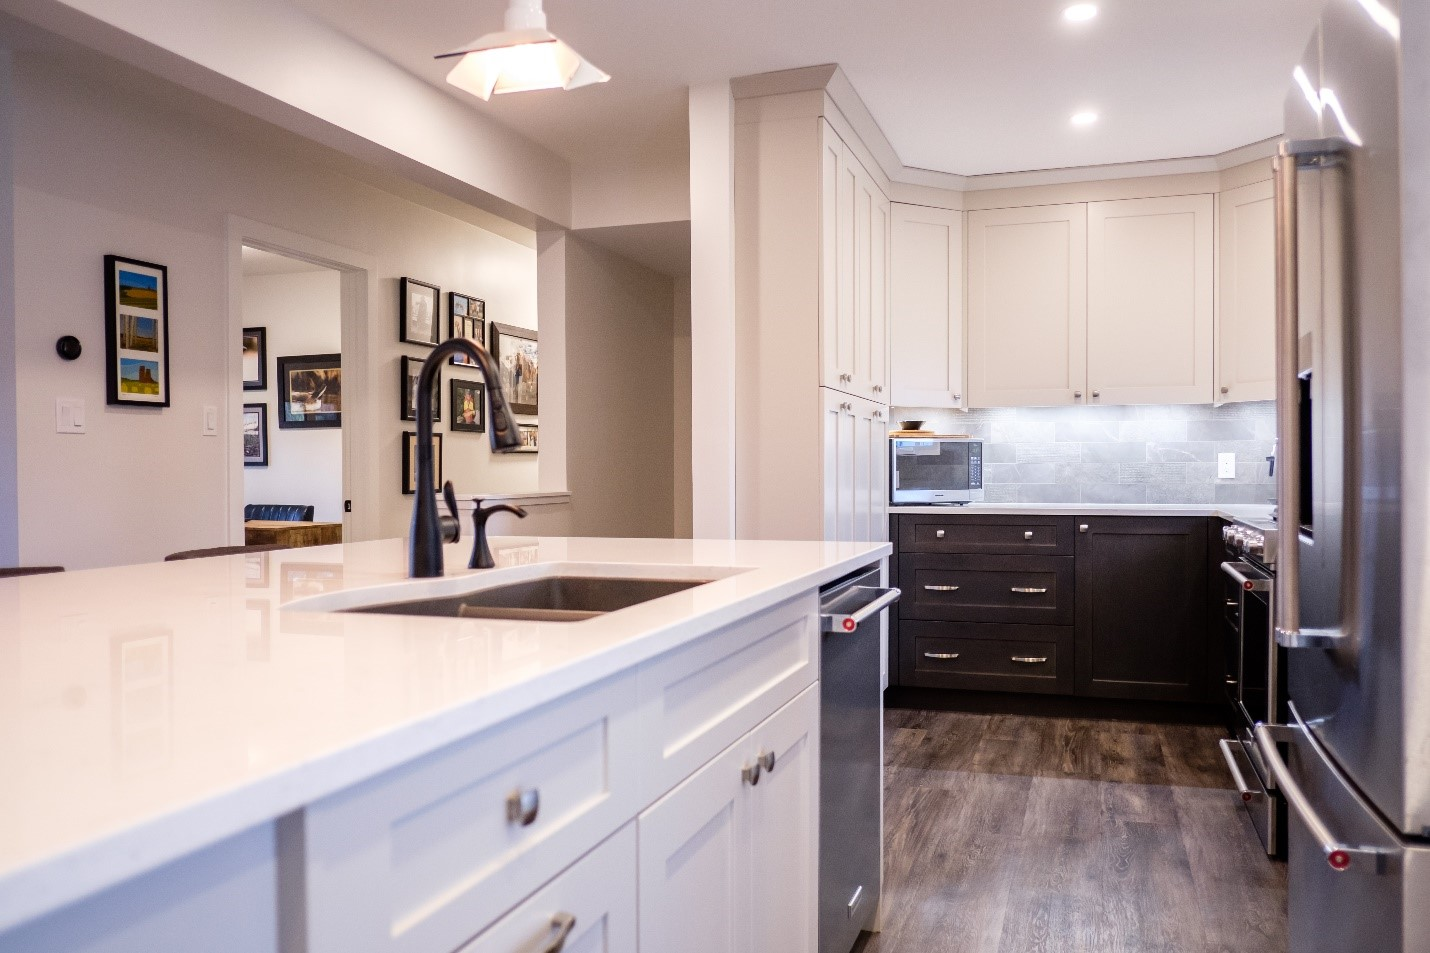 edmonton kitchen remodeling